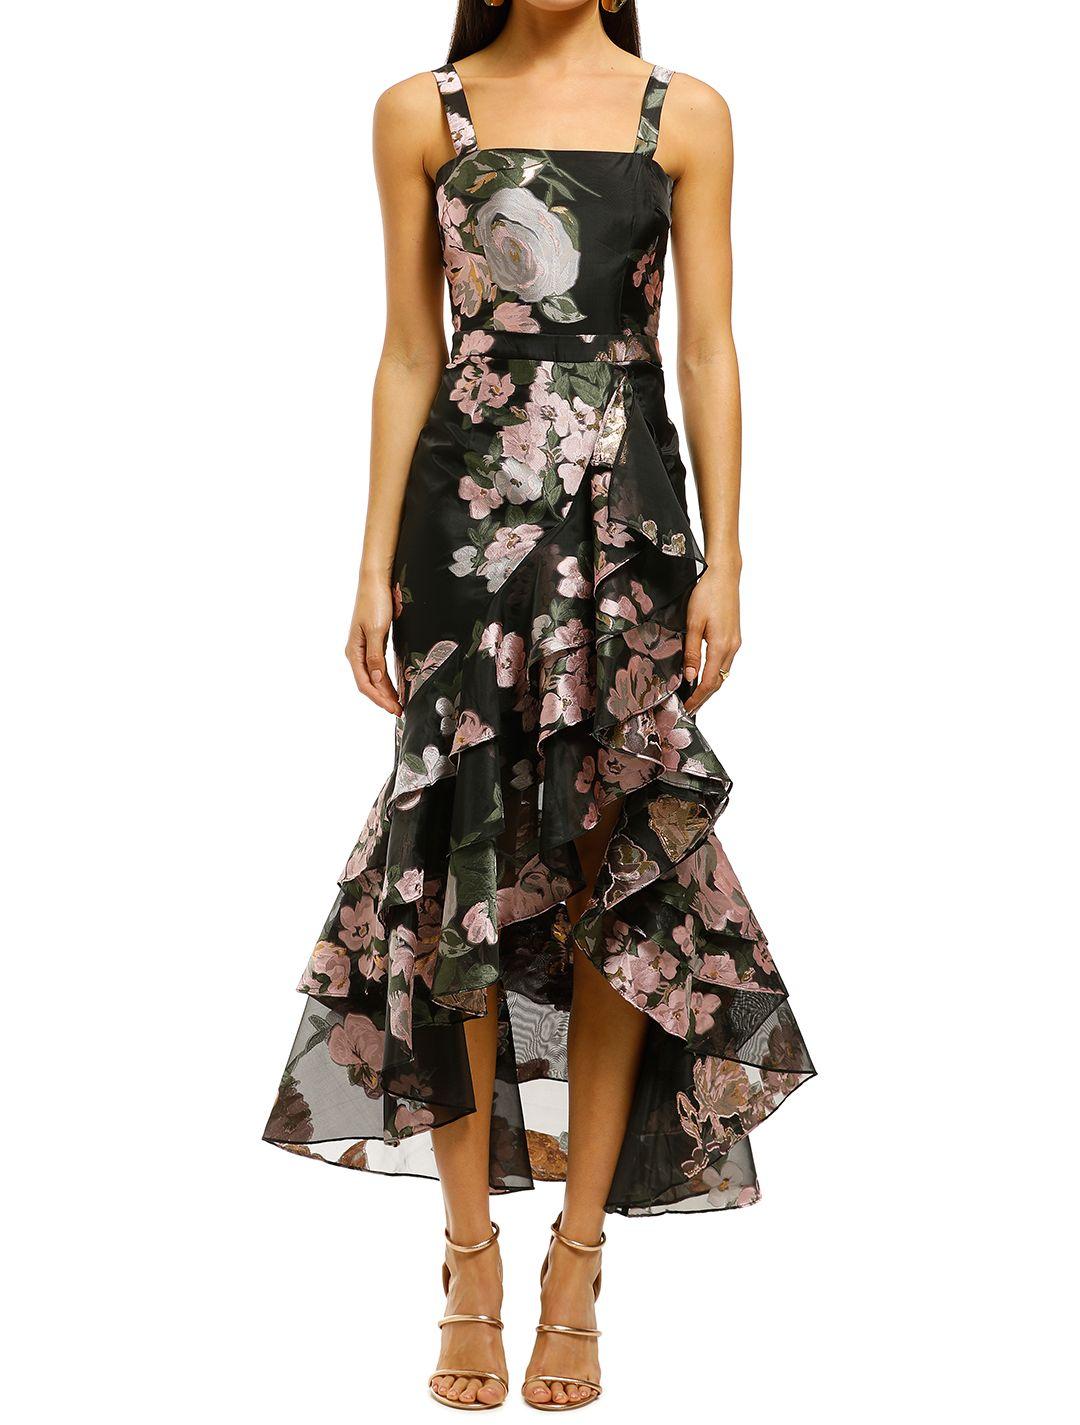 We-Are-Kindred-Claudette-Maxi-Dress-Black-Rose-Front